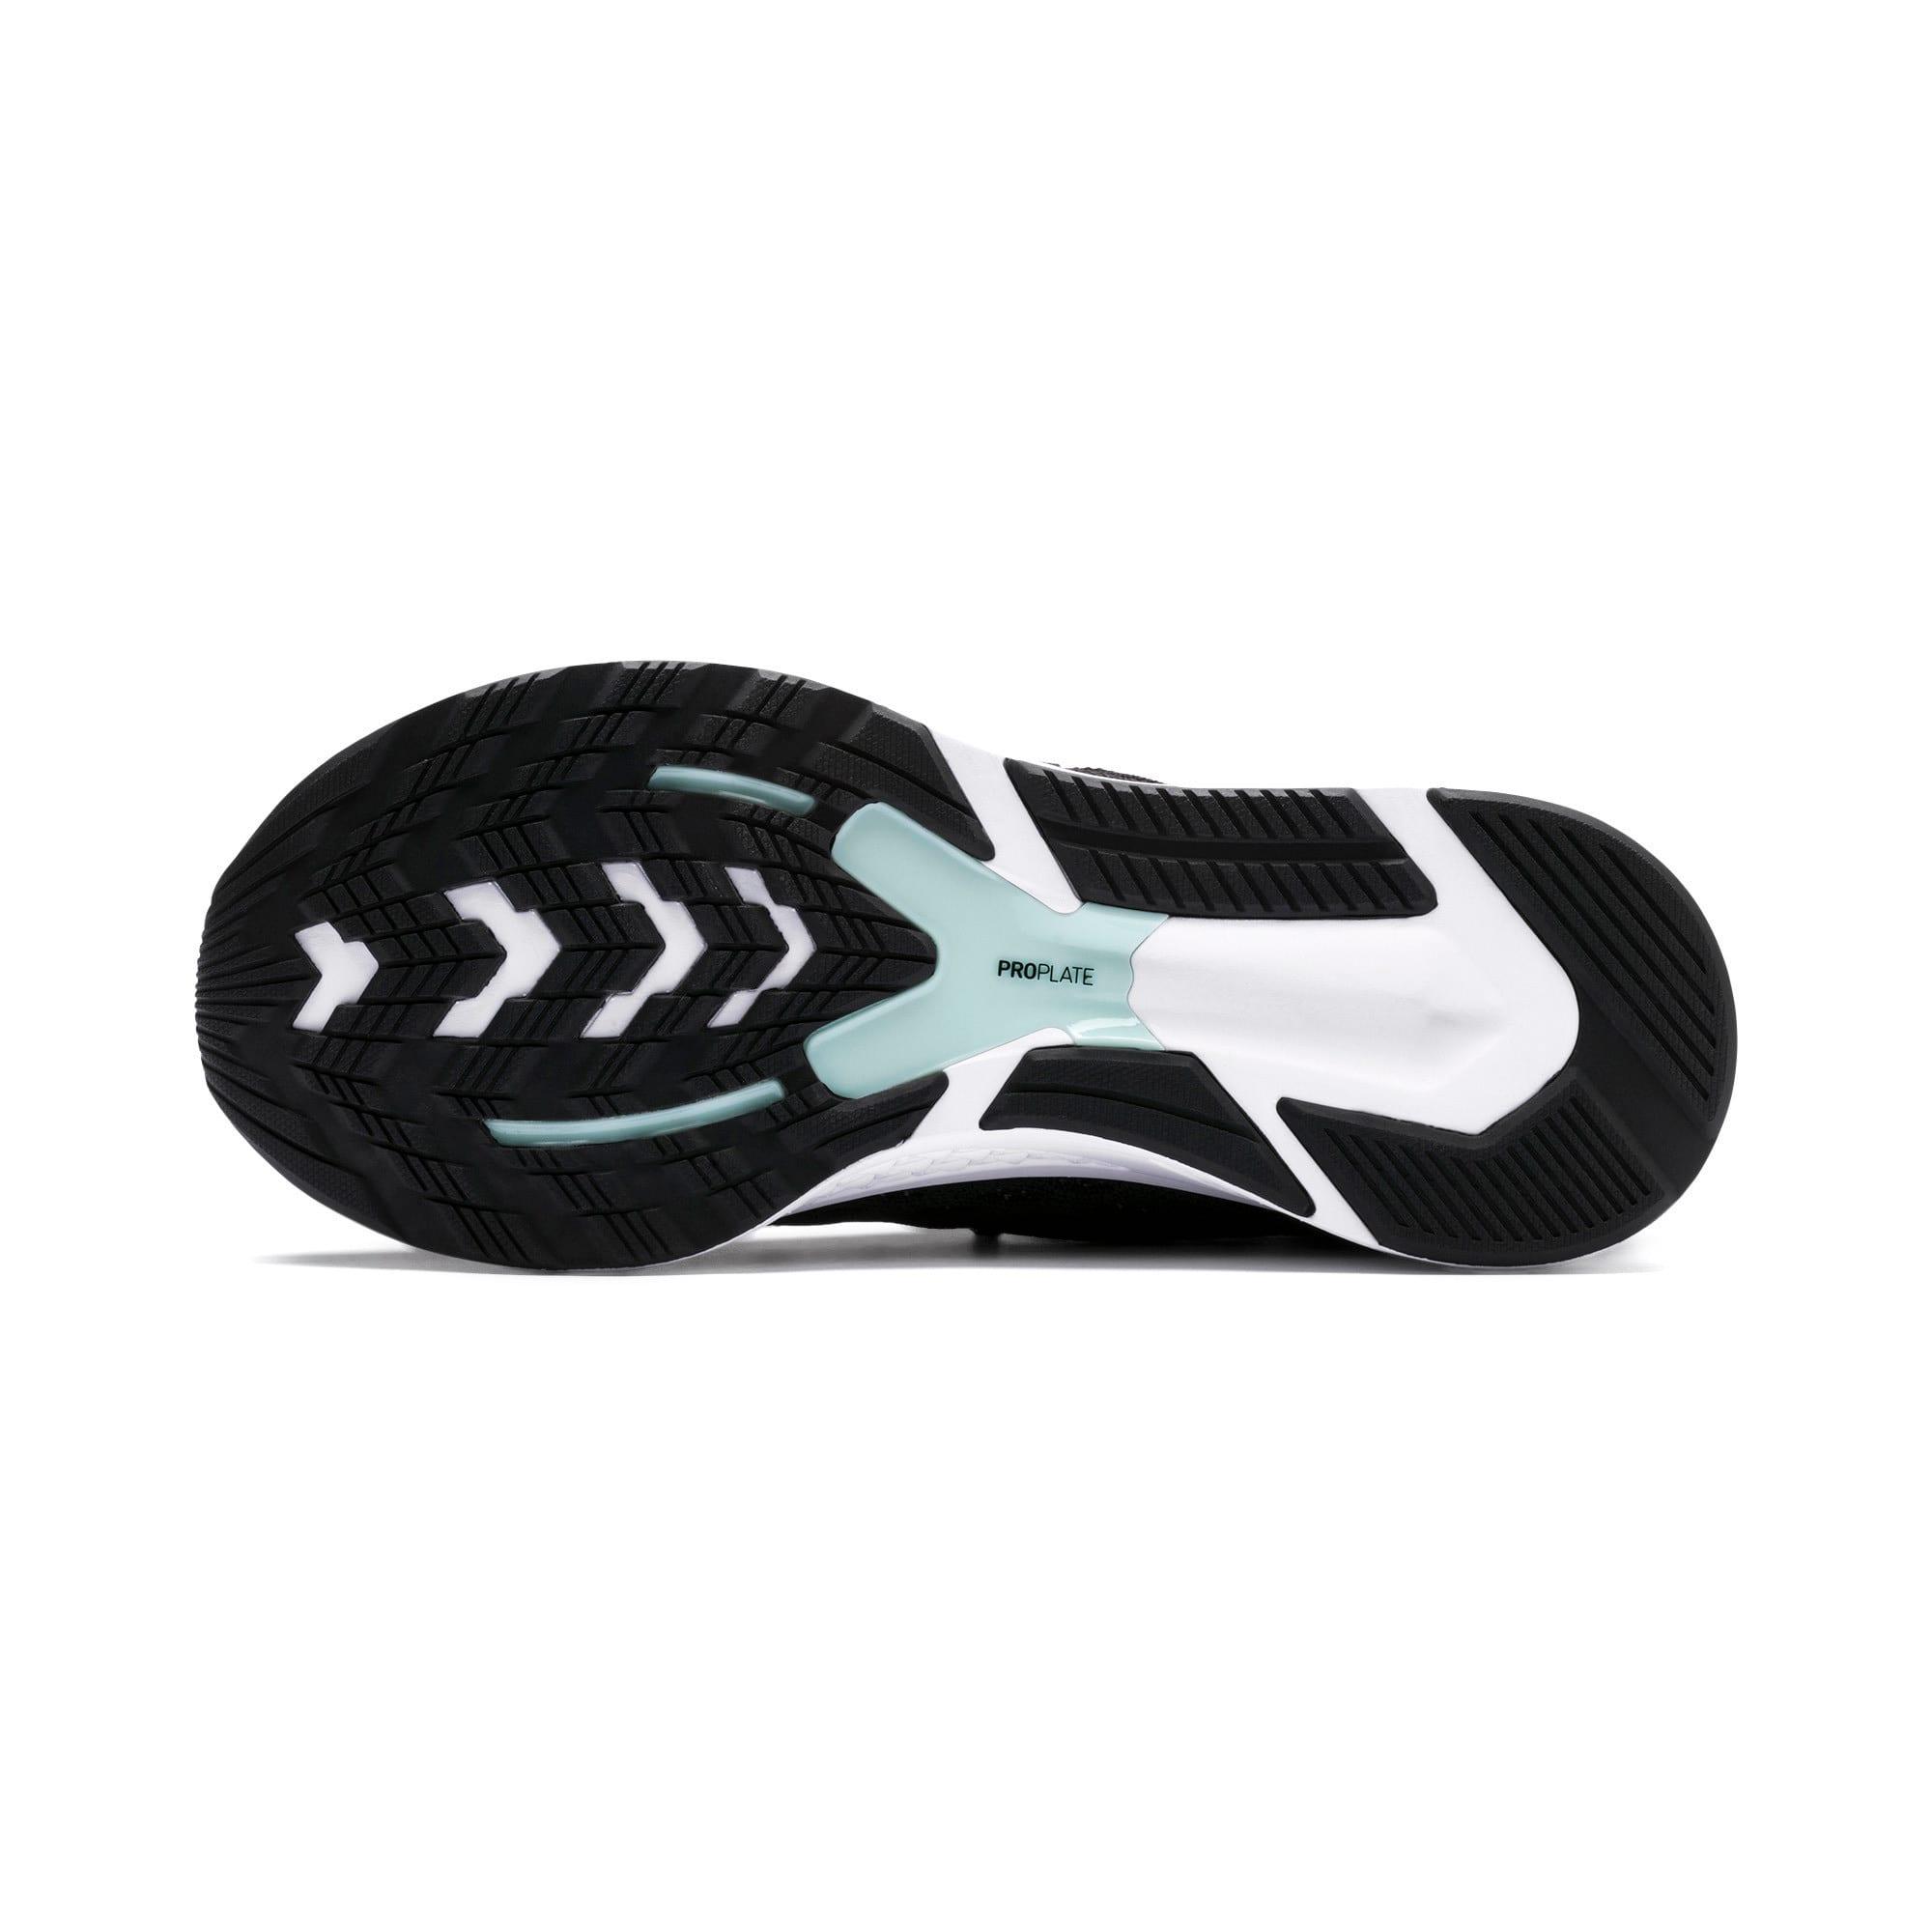 Thumbnail 5 of SPEED 500 Women's Running Shoes, Puma Black-Puma White, medium